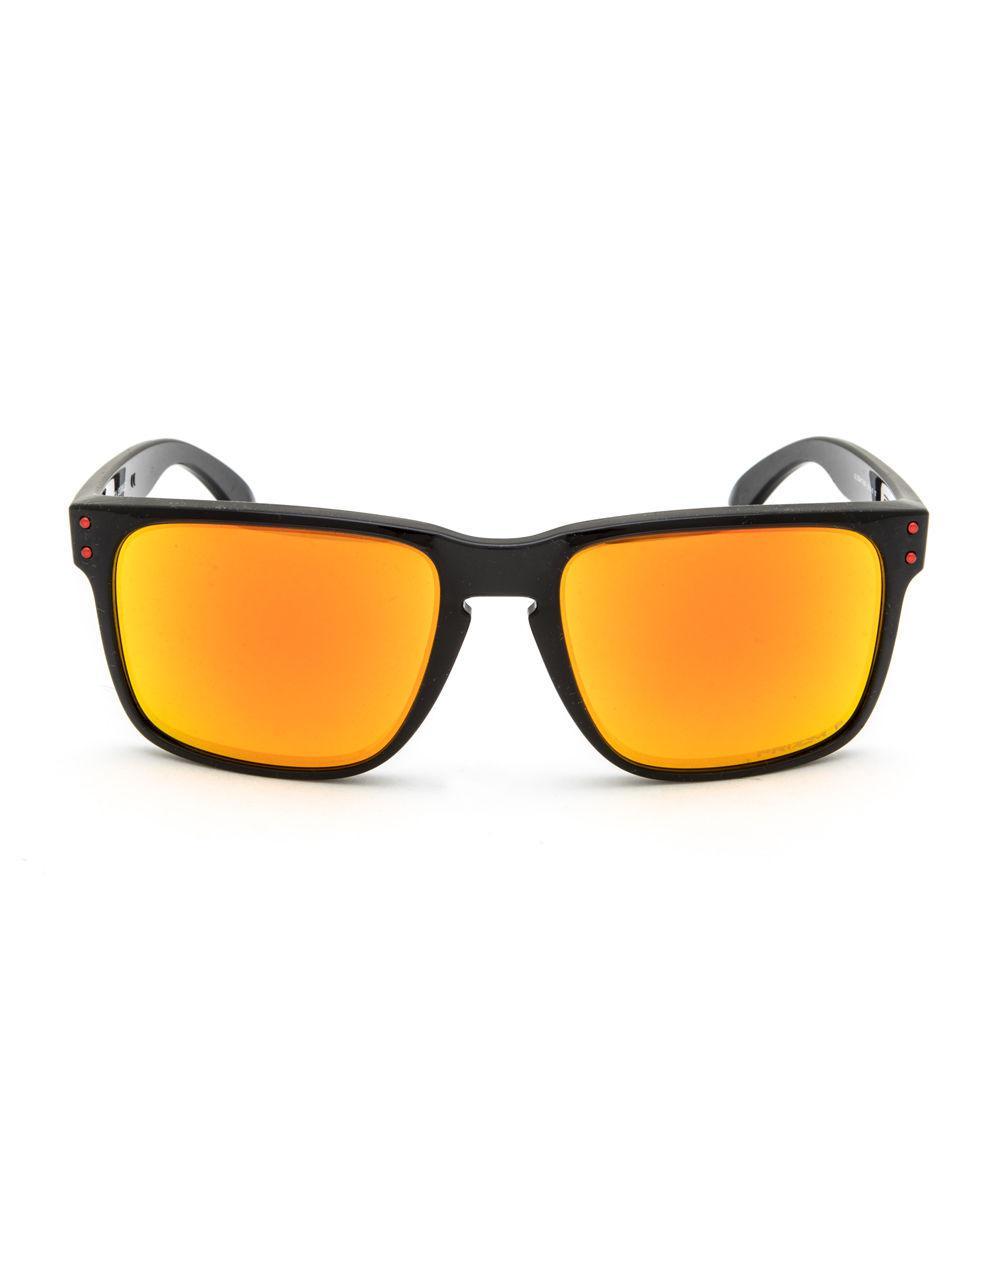 8c1831239b Lyst - Oakley Holbrook Xl Black   Red Sunglasses in Black for Men